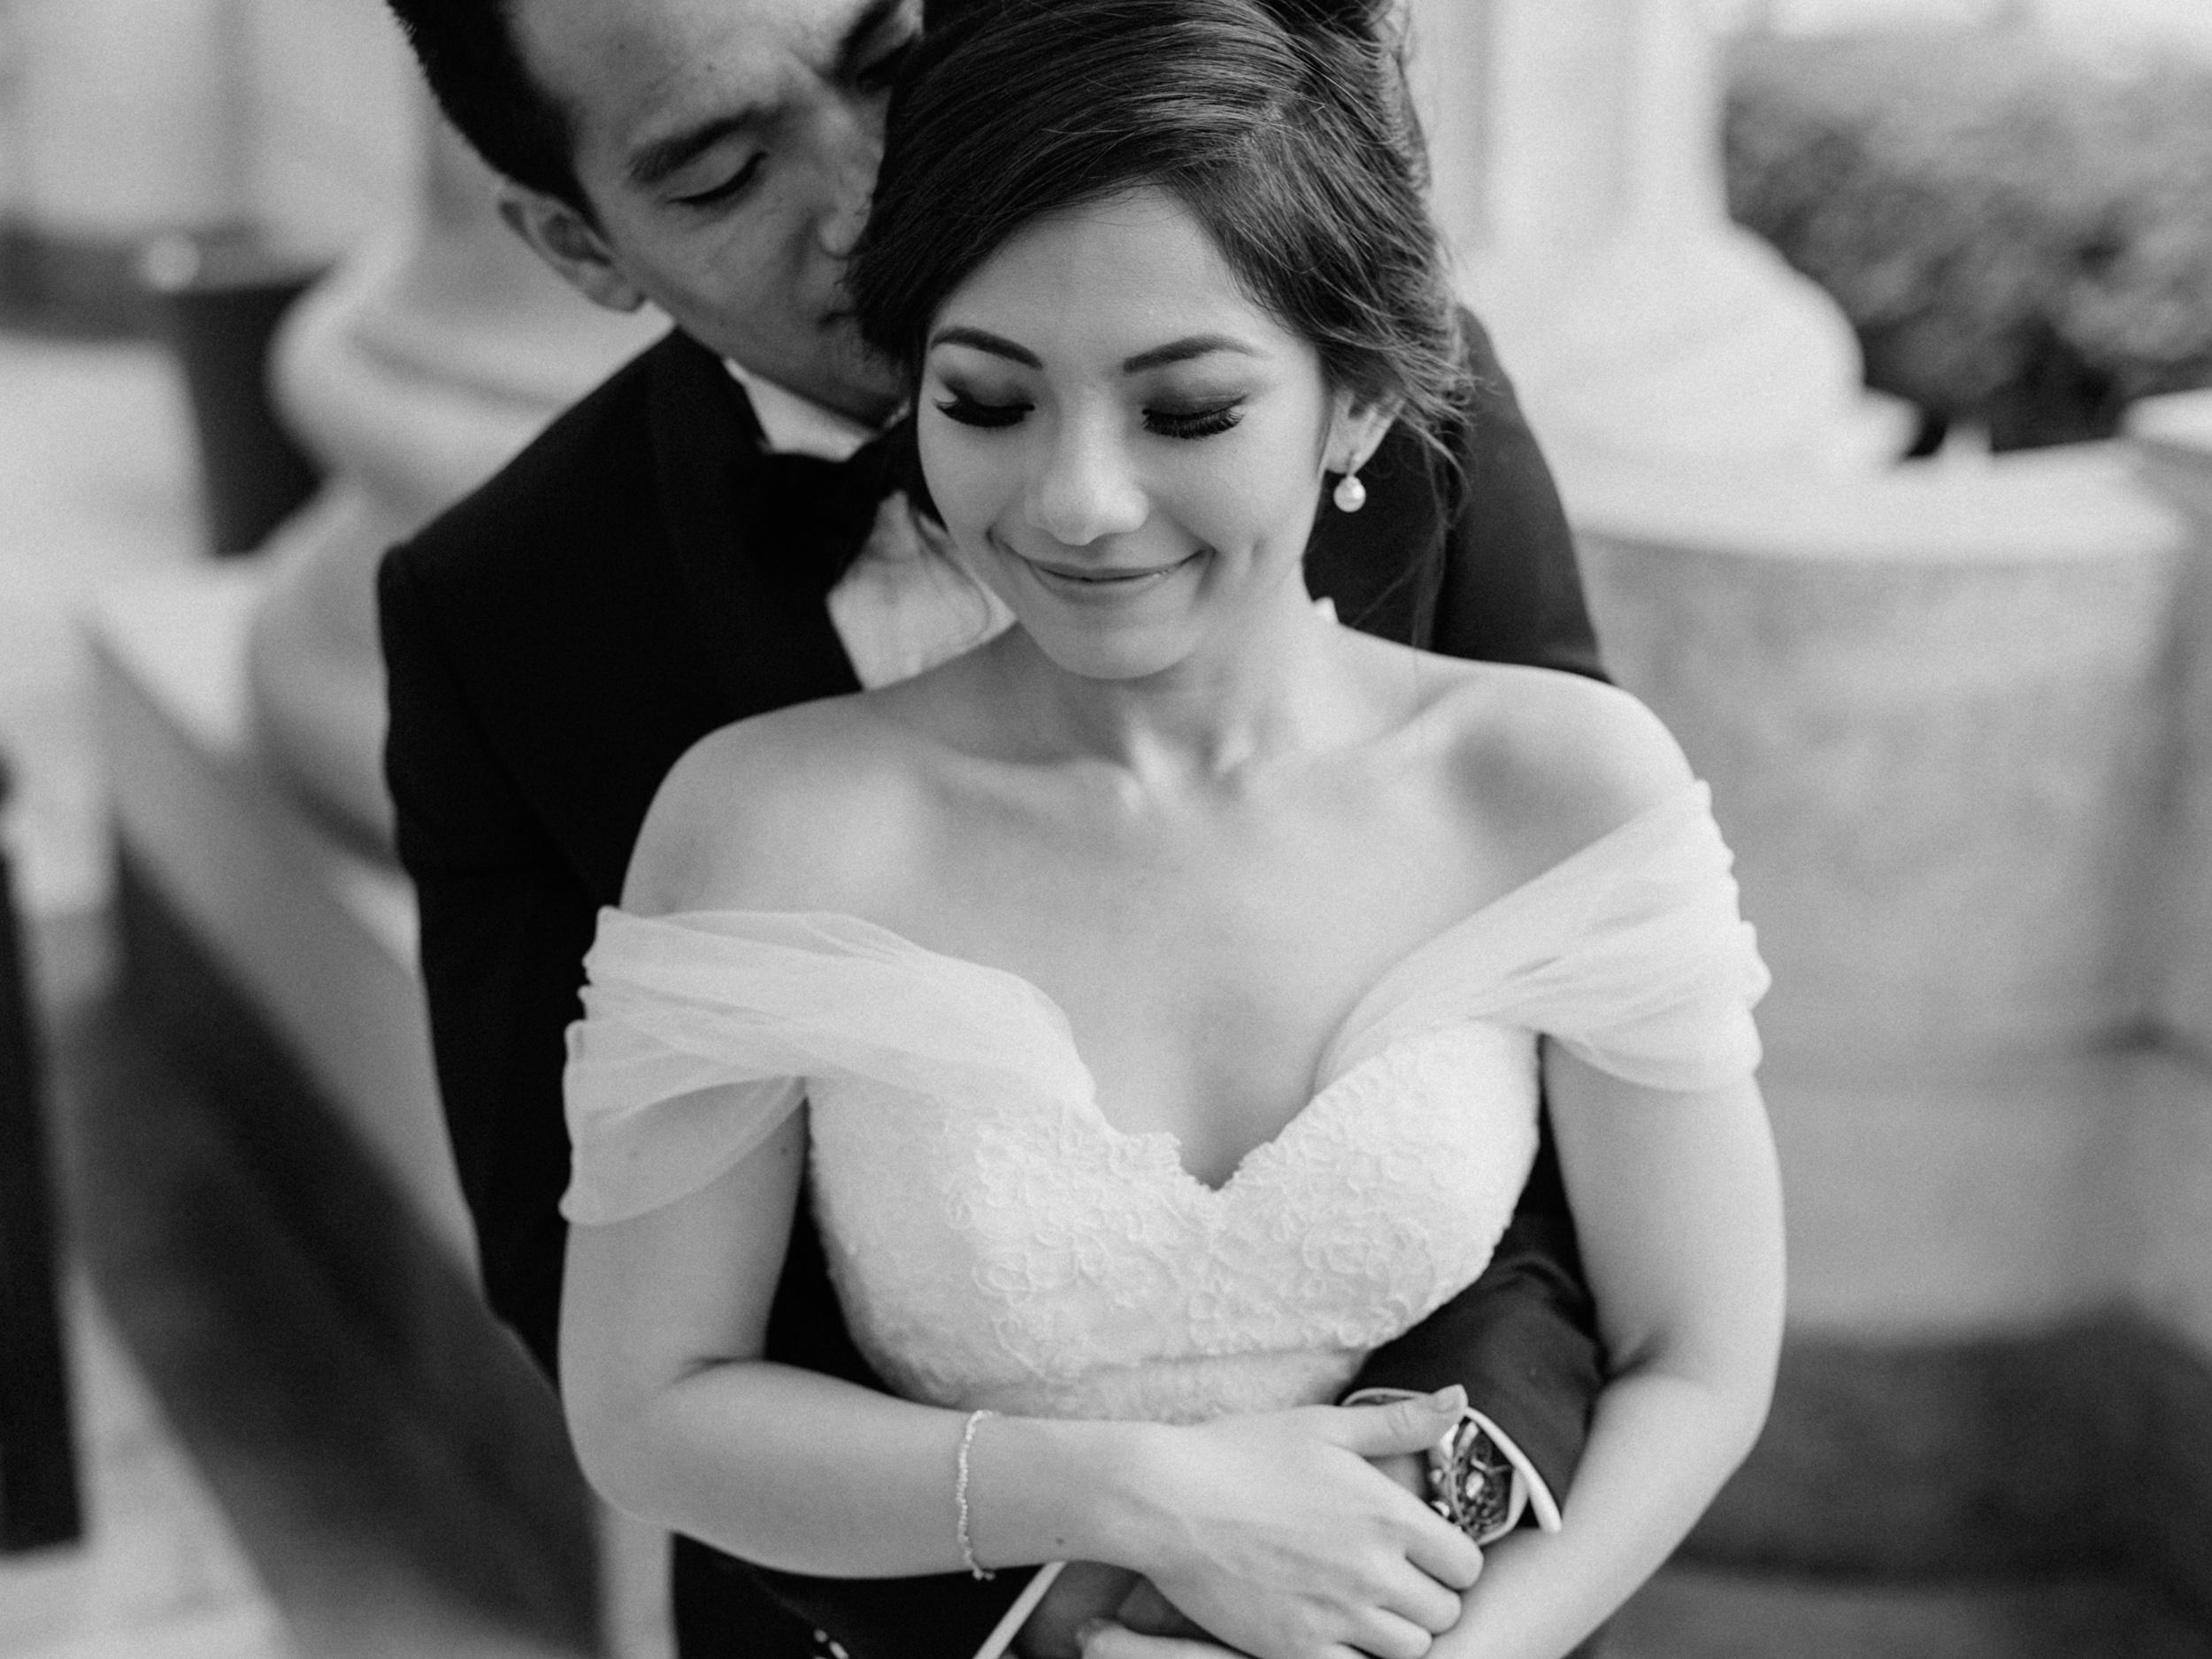 singapore-wedding-photographer-cheryl-matthew-fullerton-hotel-wedding-42.jpg